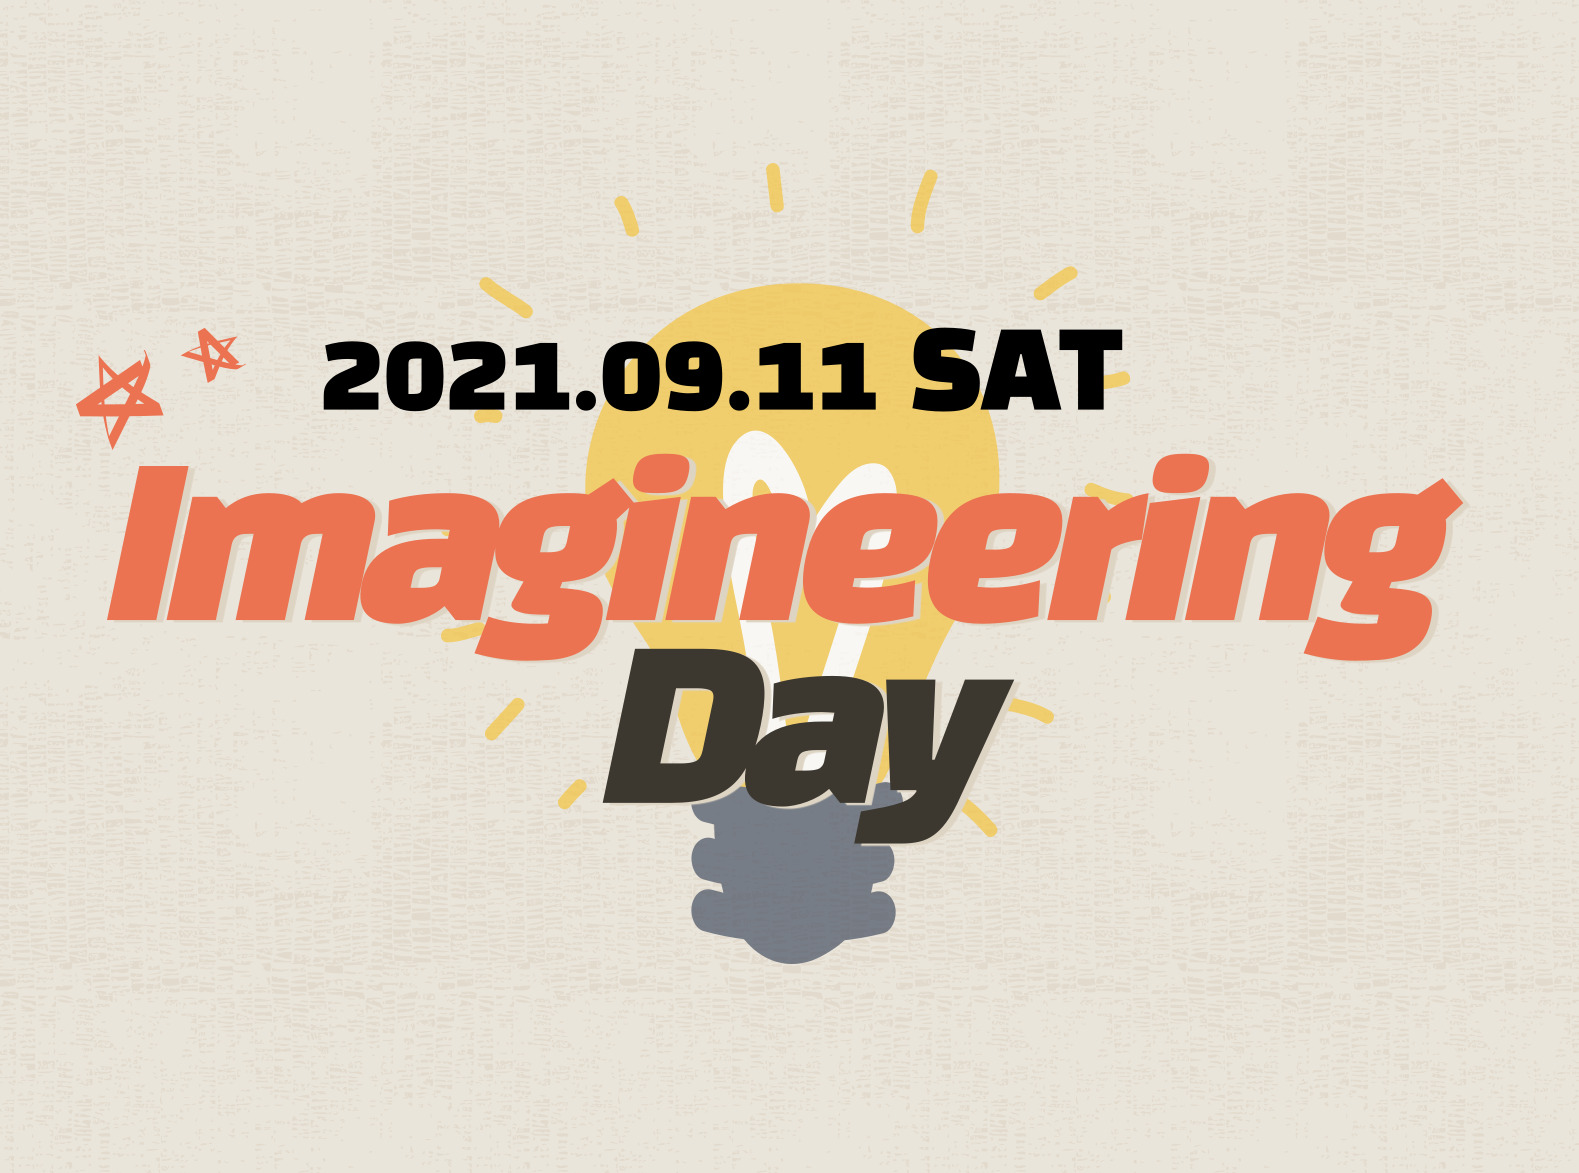 Imagineering Day 1차 진행